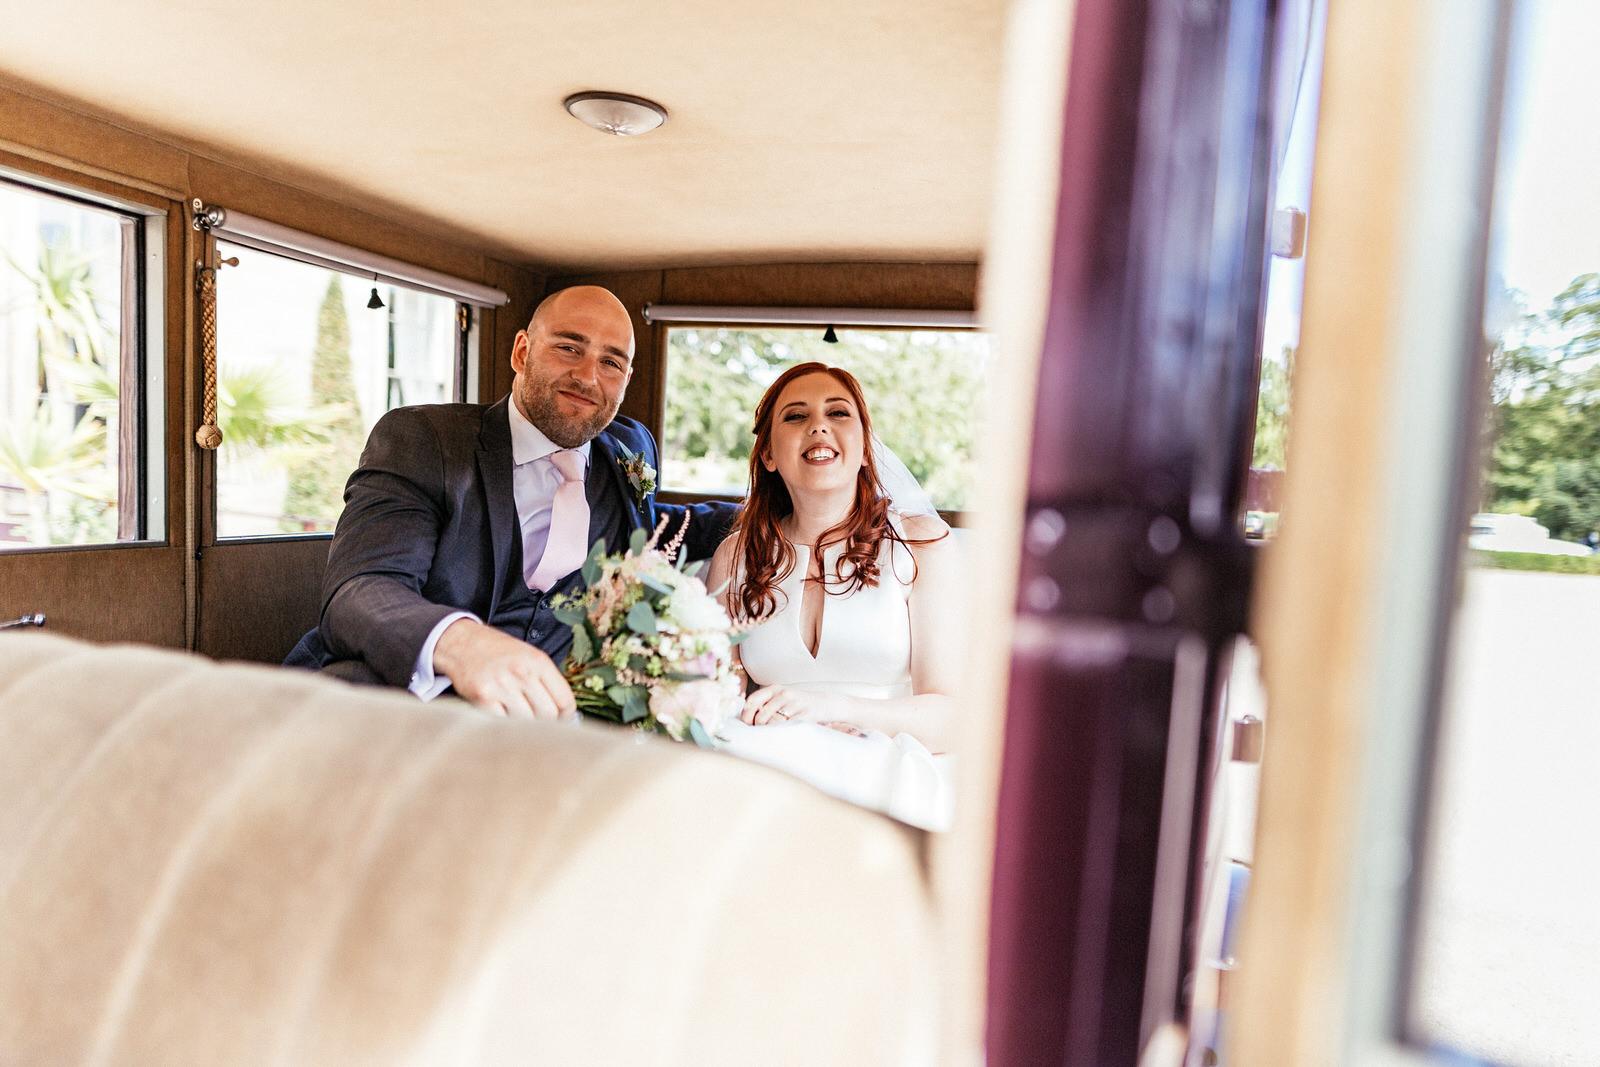 Beamish-Hall-Wedding-Photographer-026.jpg